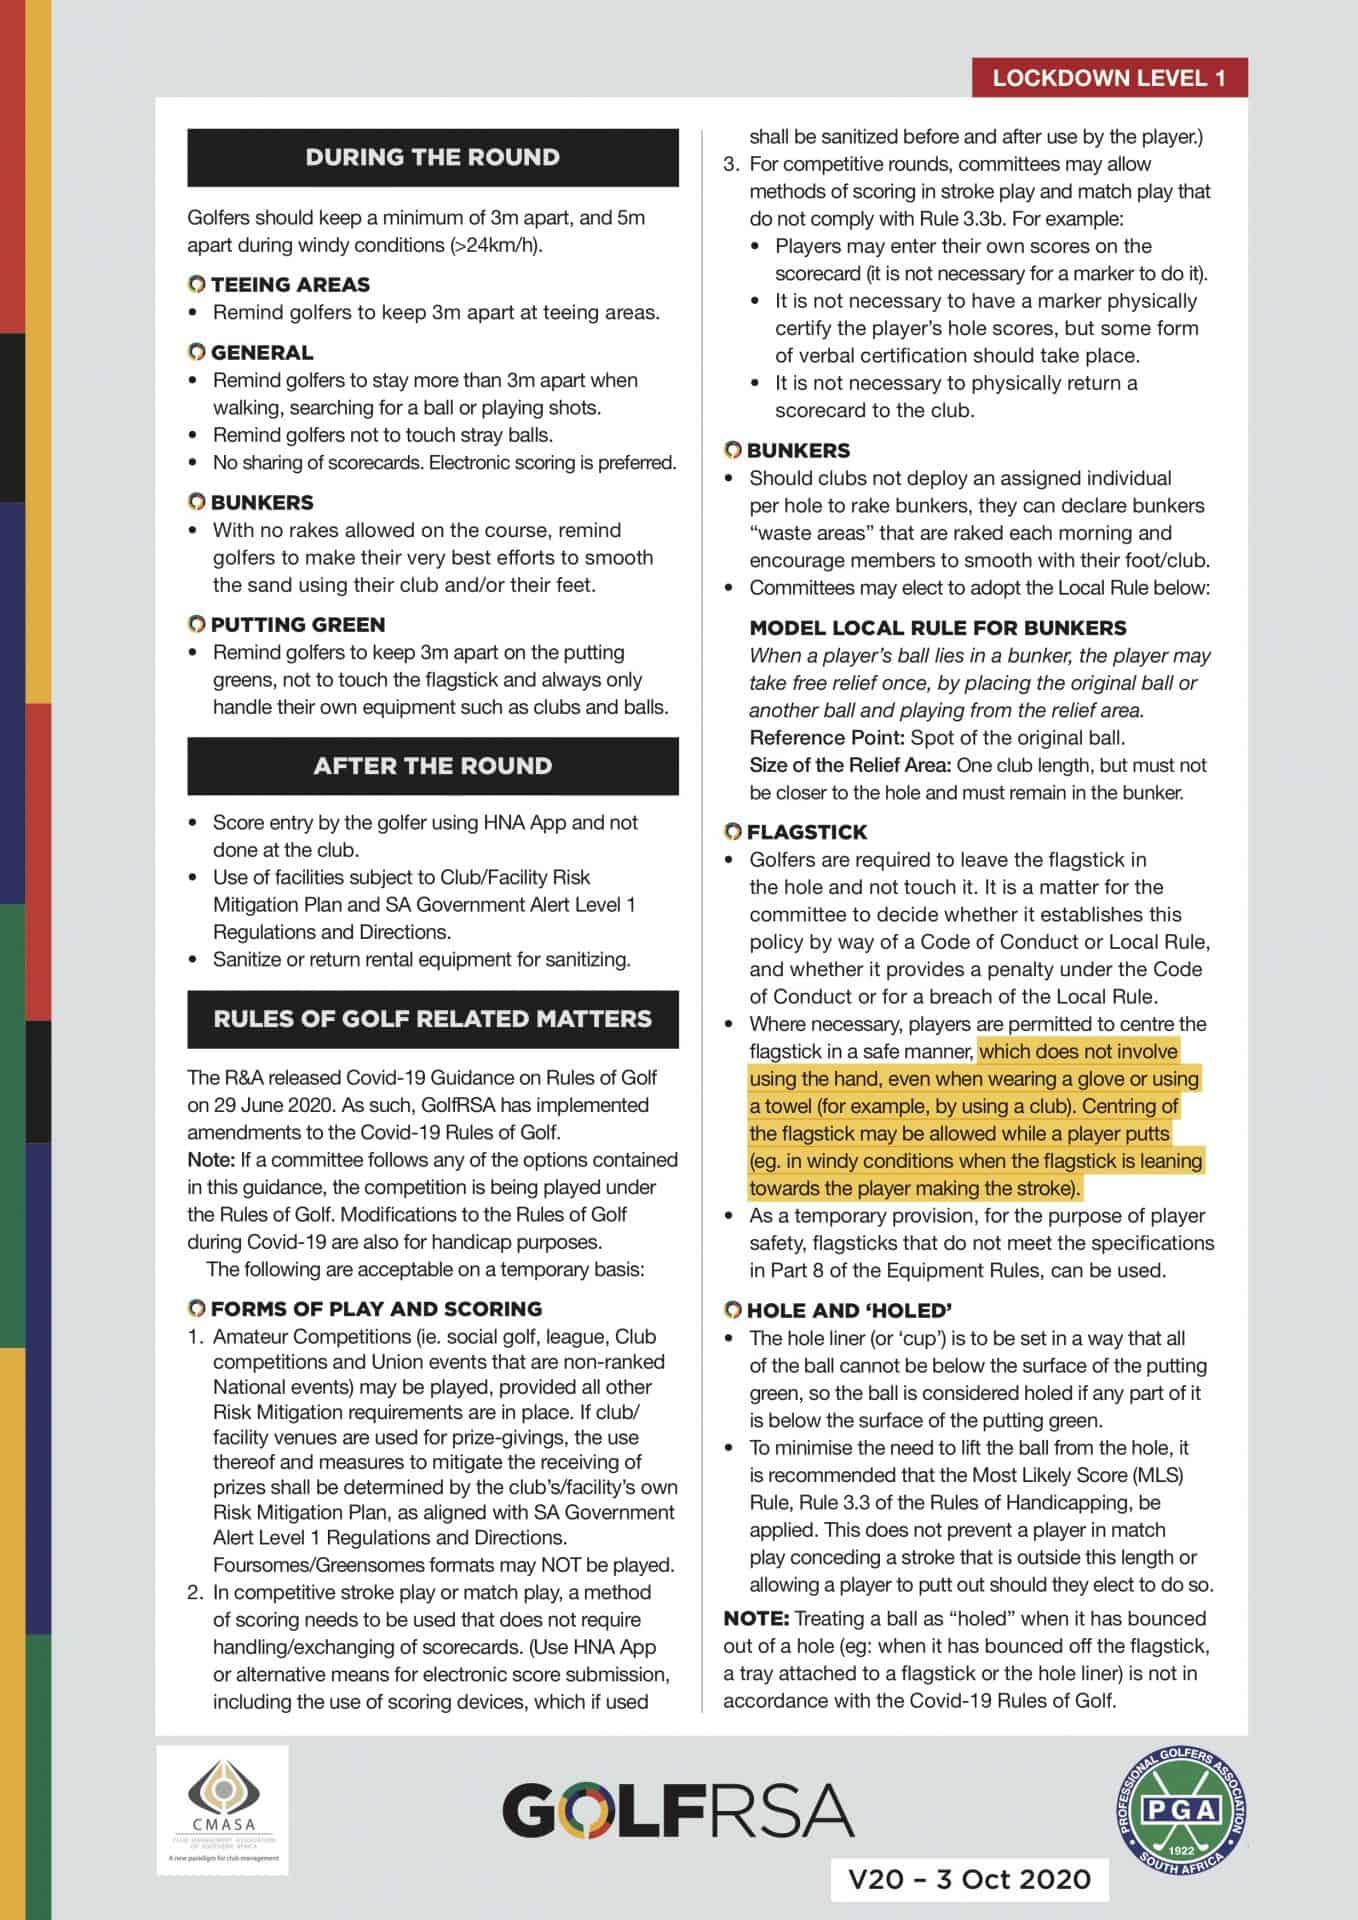 GolfRSA Good Practice Guidelines V20_with markup - 2